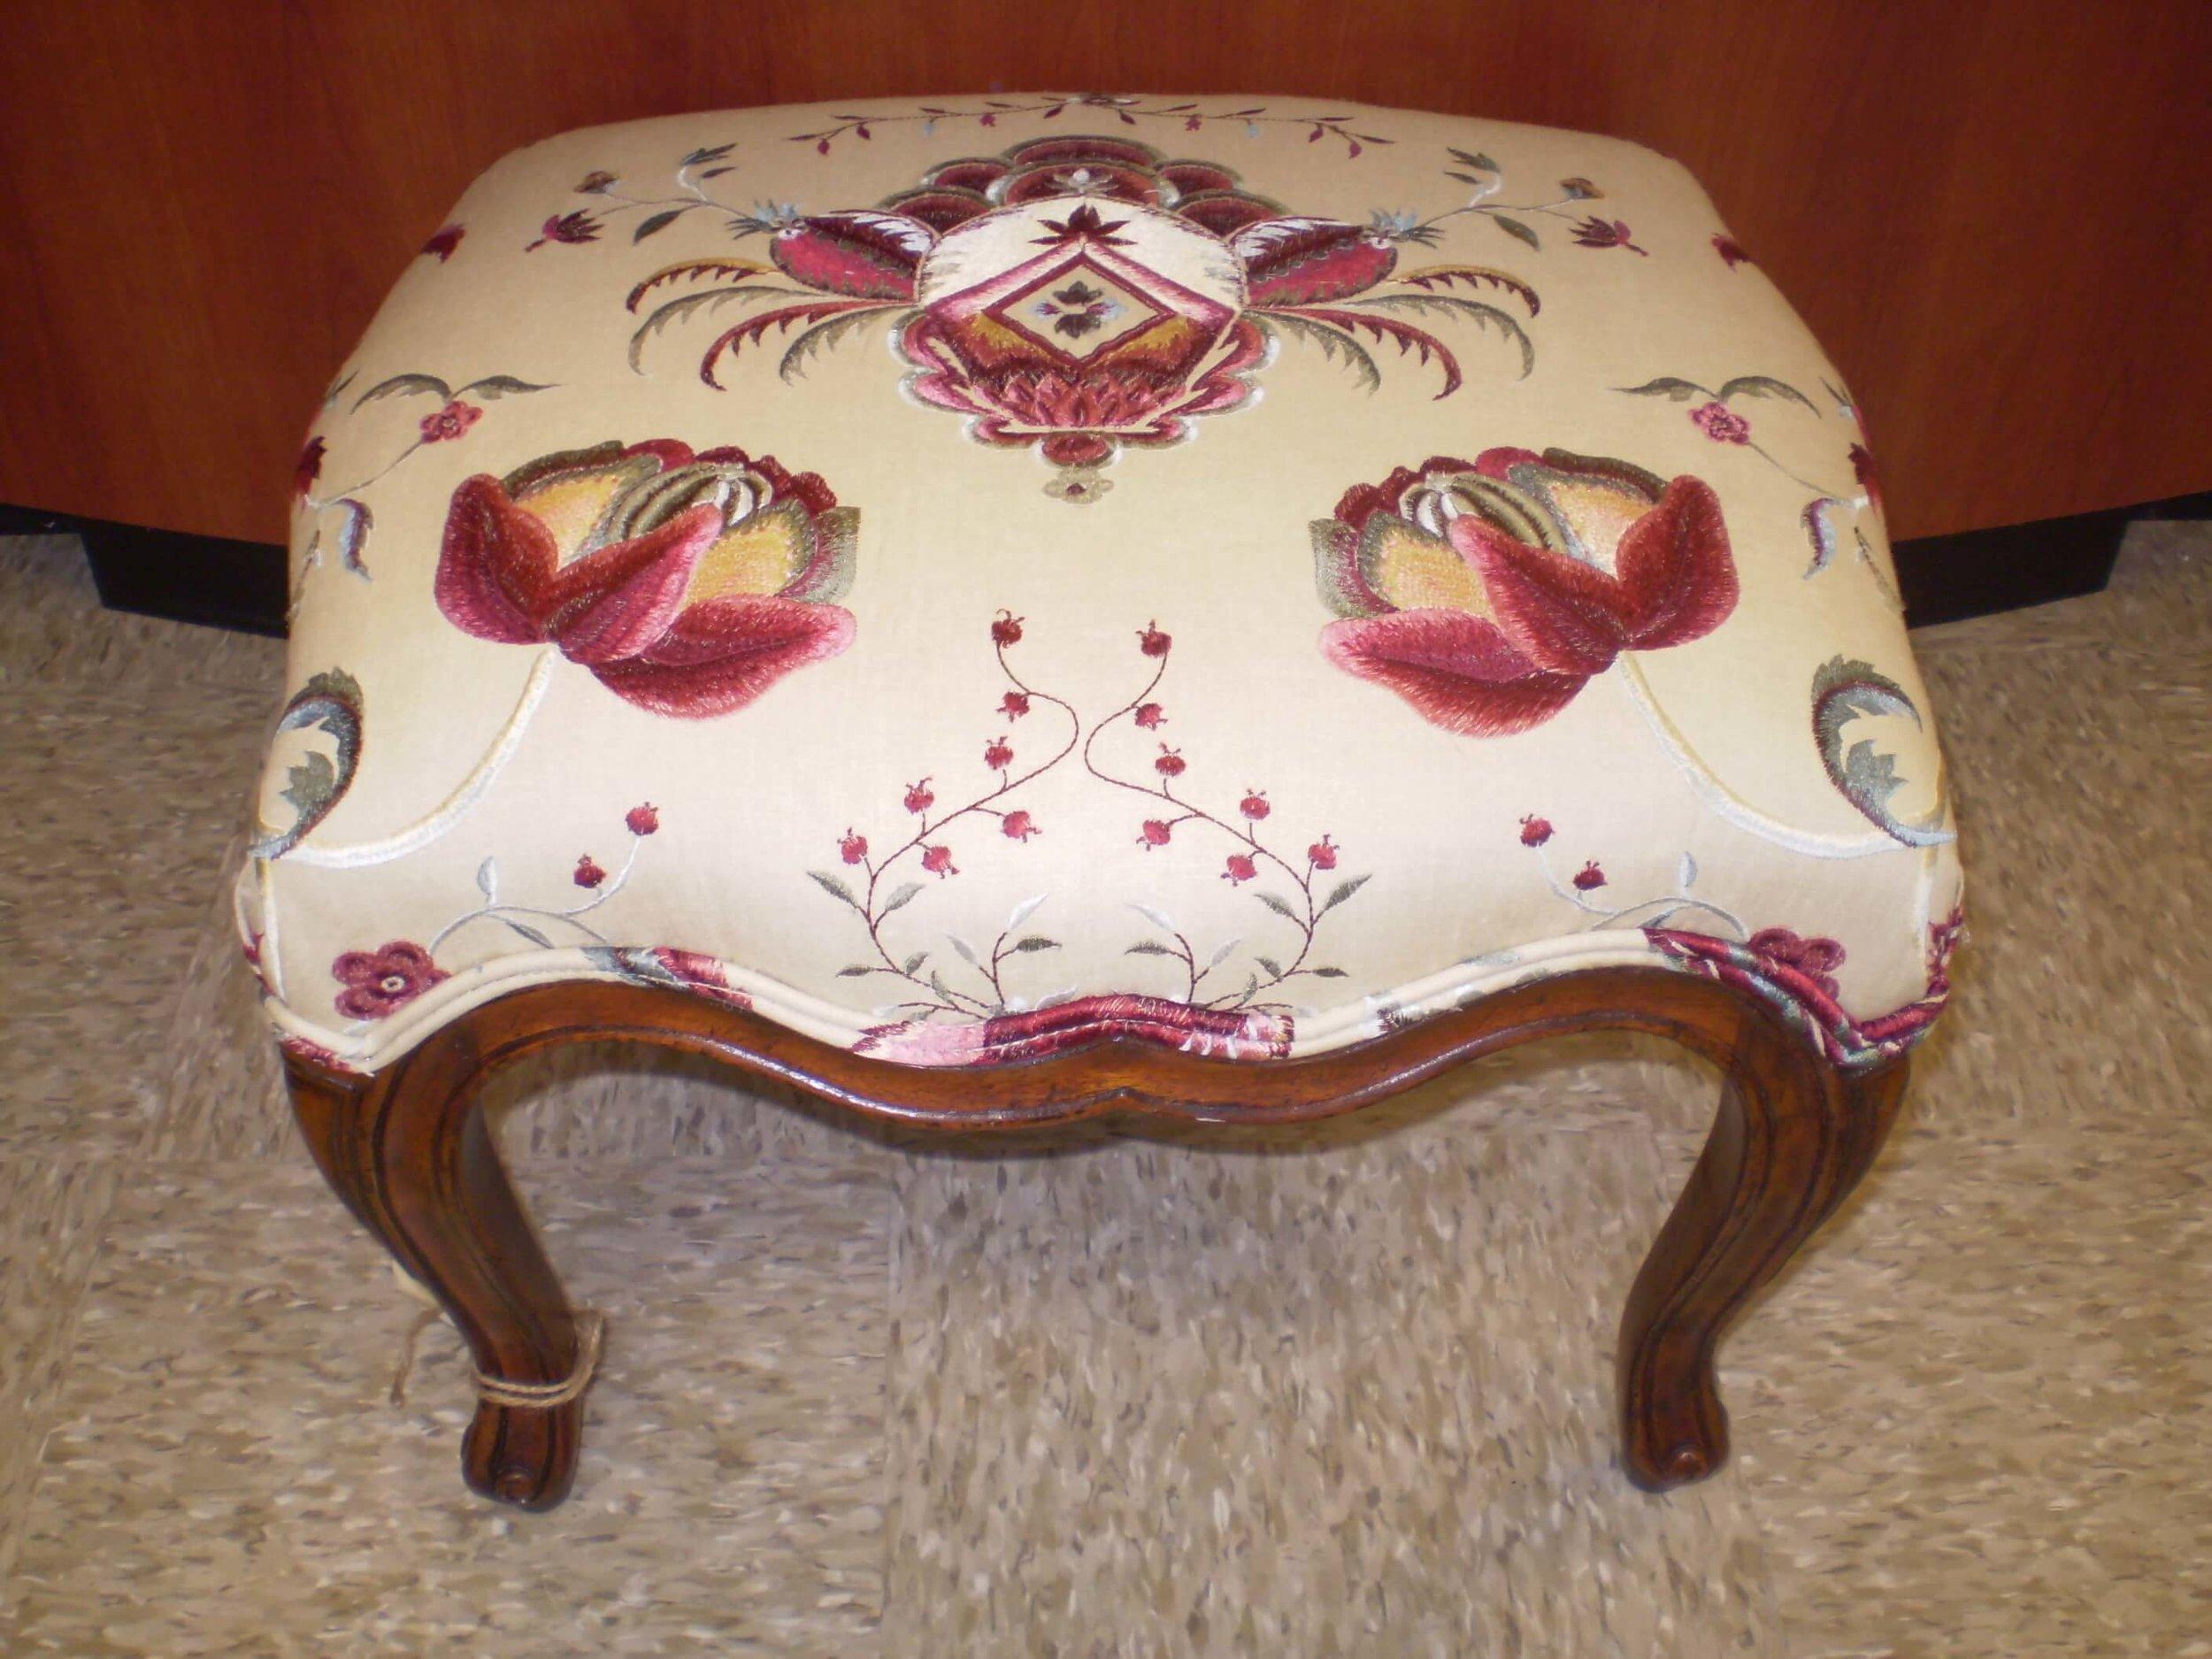 custom-furniture-upholstery-design-atlanta-georgia-12.JPG